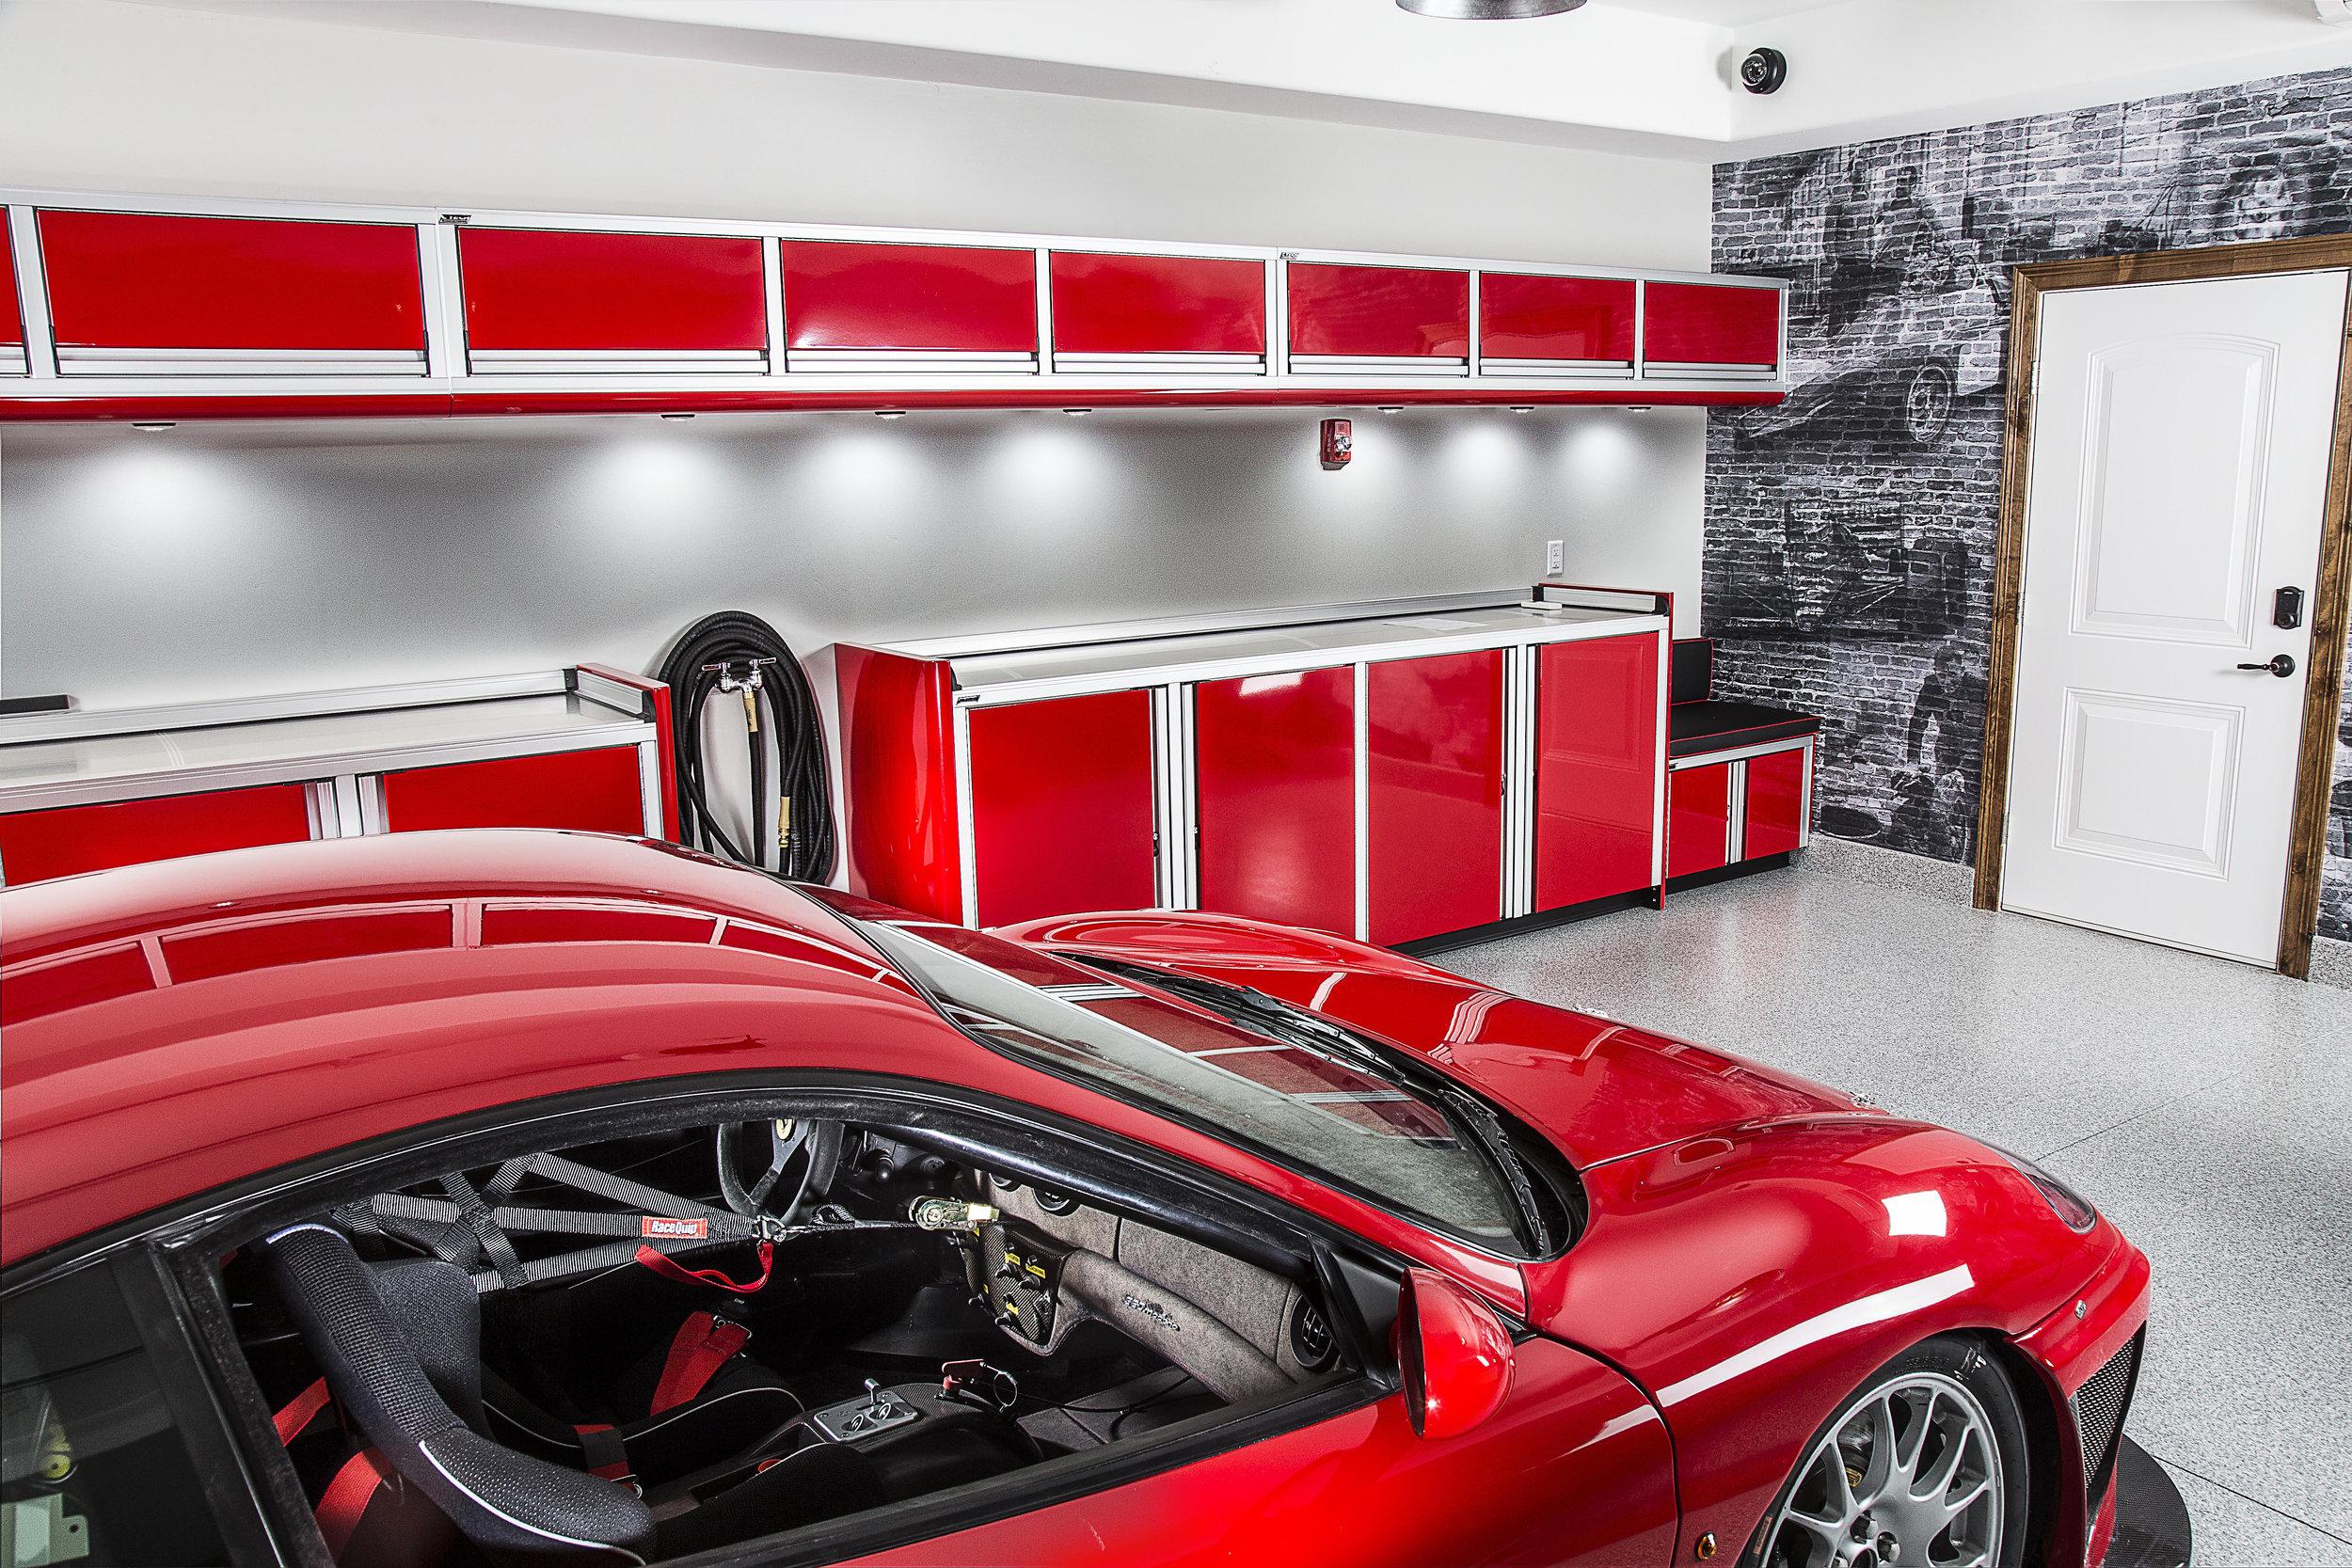 Ferrari+Garage+2.jpg